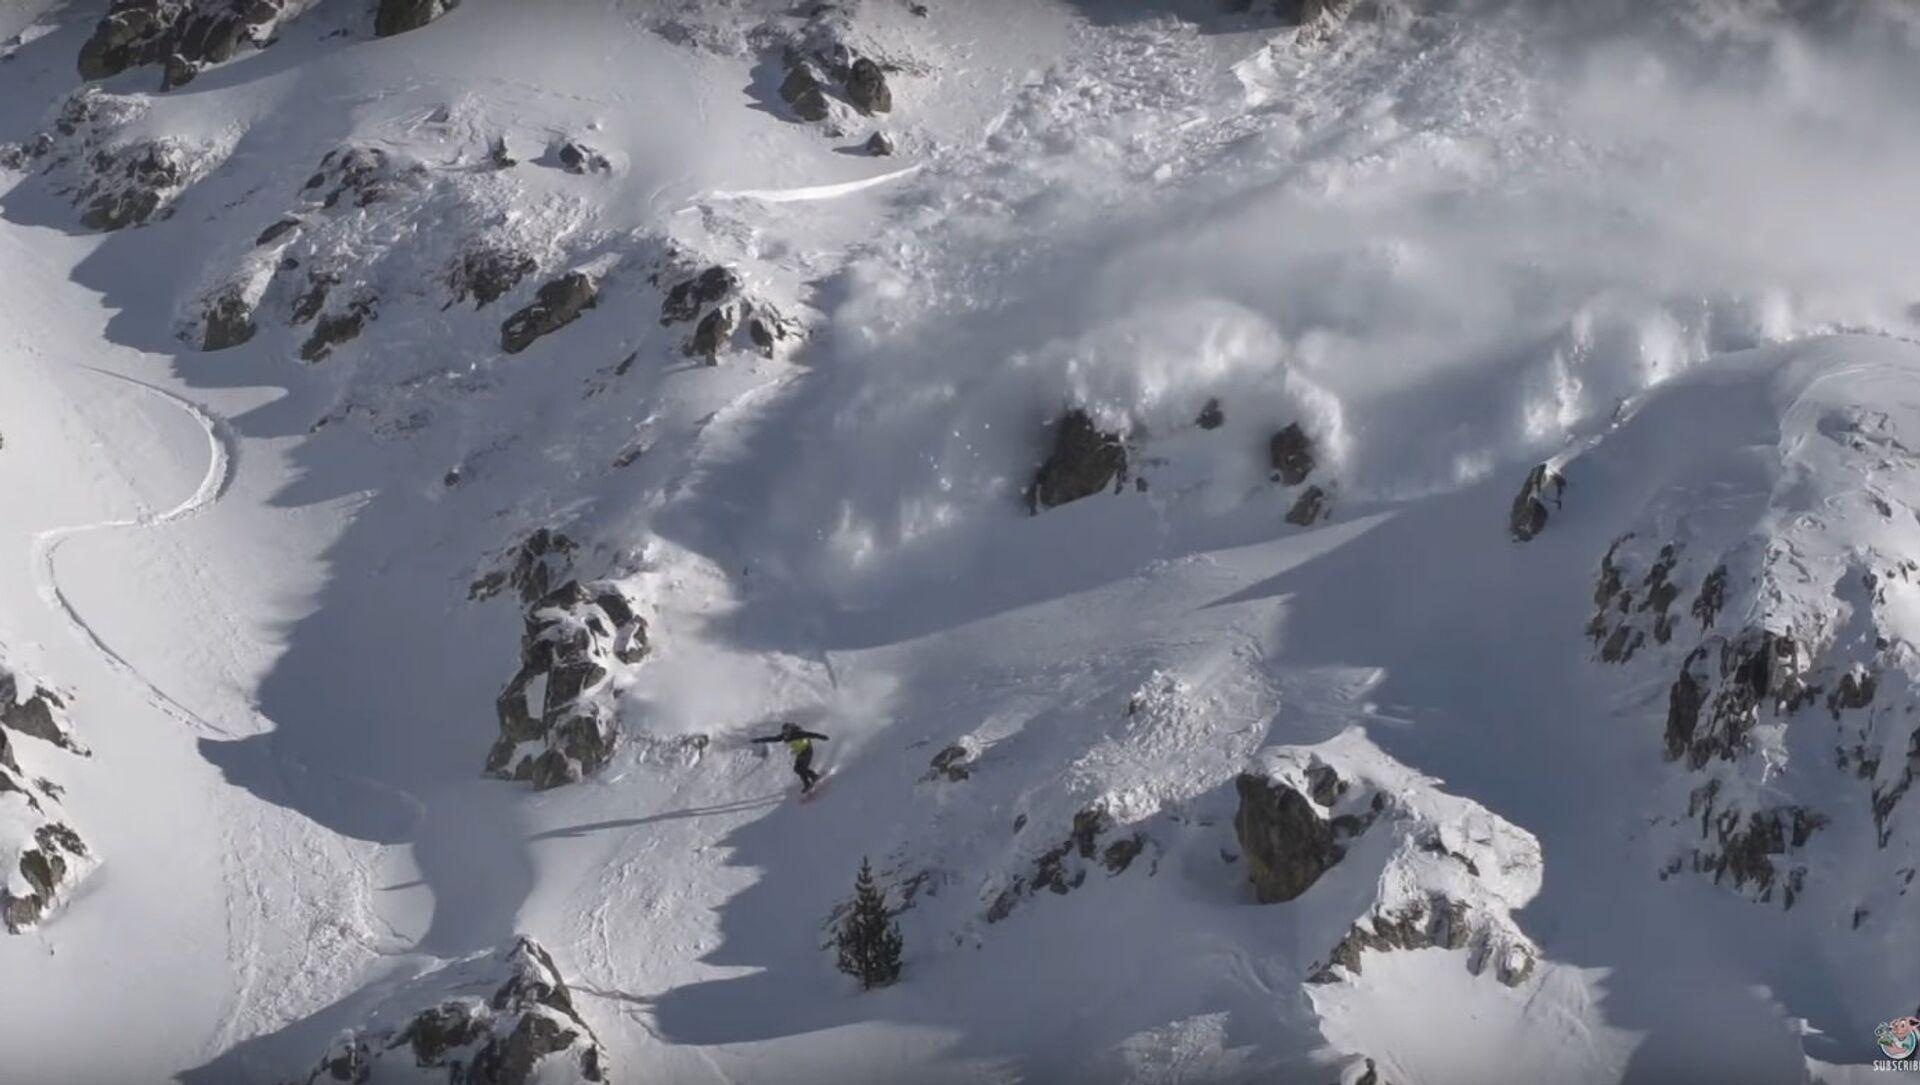 Avalanche in the Heart of the Pyrenees || ViralHog - Sputnik International, 1920, 25.07.2021